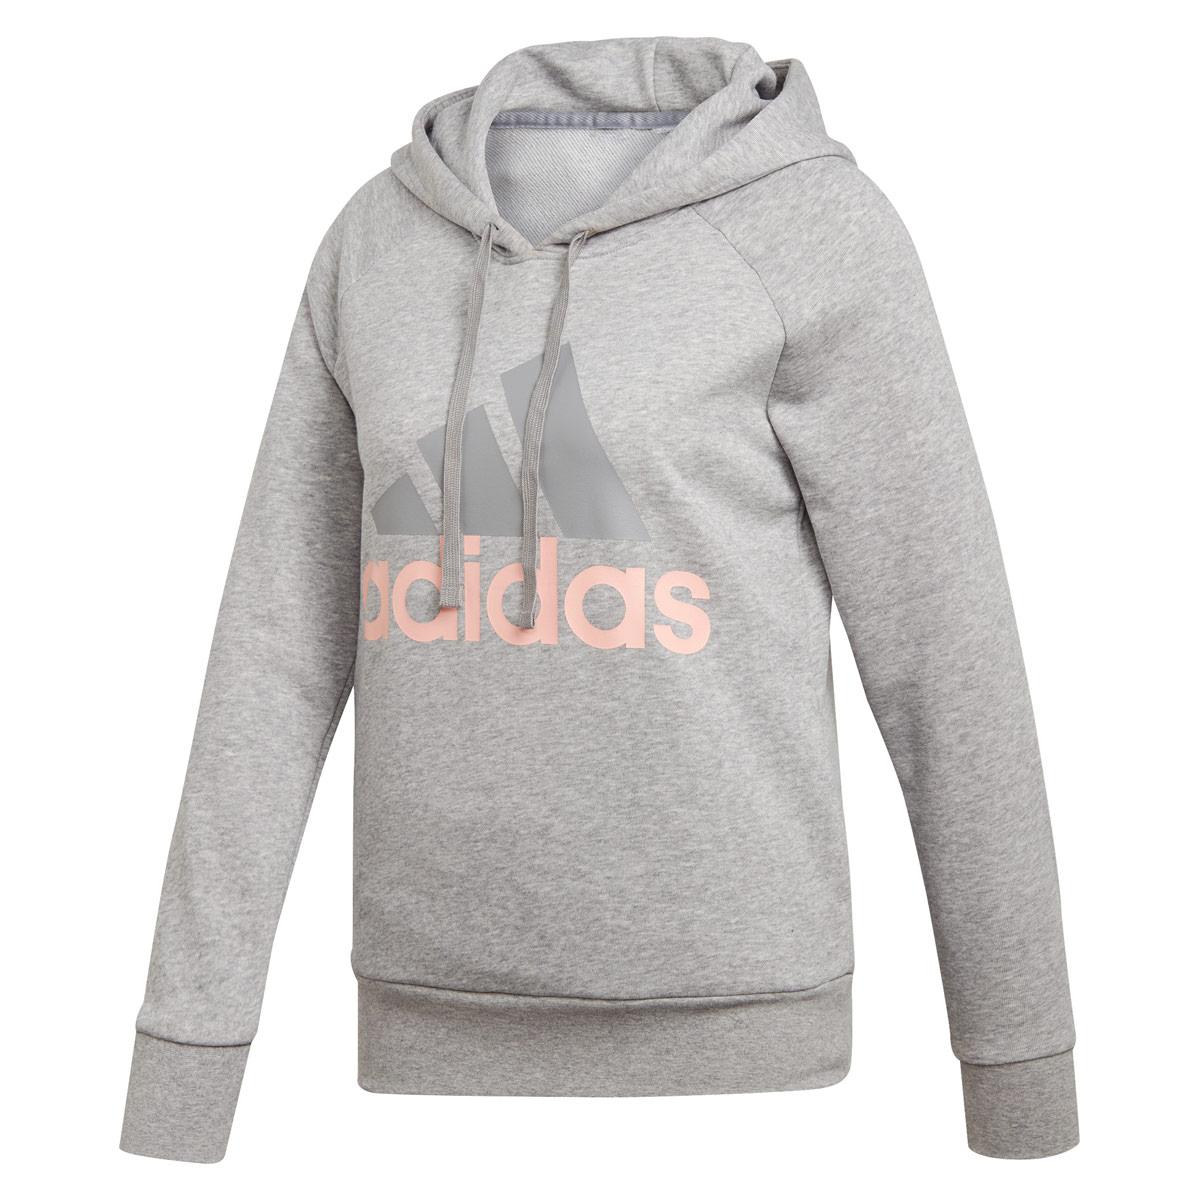 8a482fe9d3d4 adidas Essentials Linear Pullover Hoodie - Sweatshirts / Hoodies for Women  - Grey | 21RUN